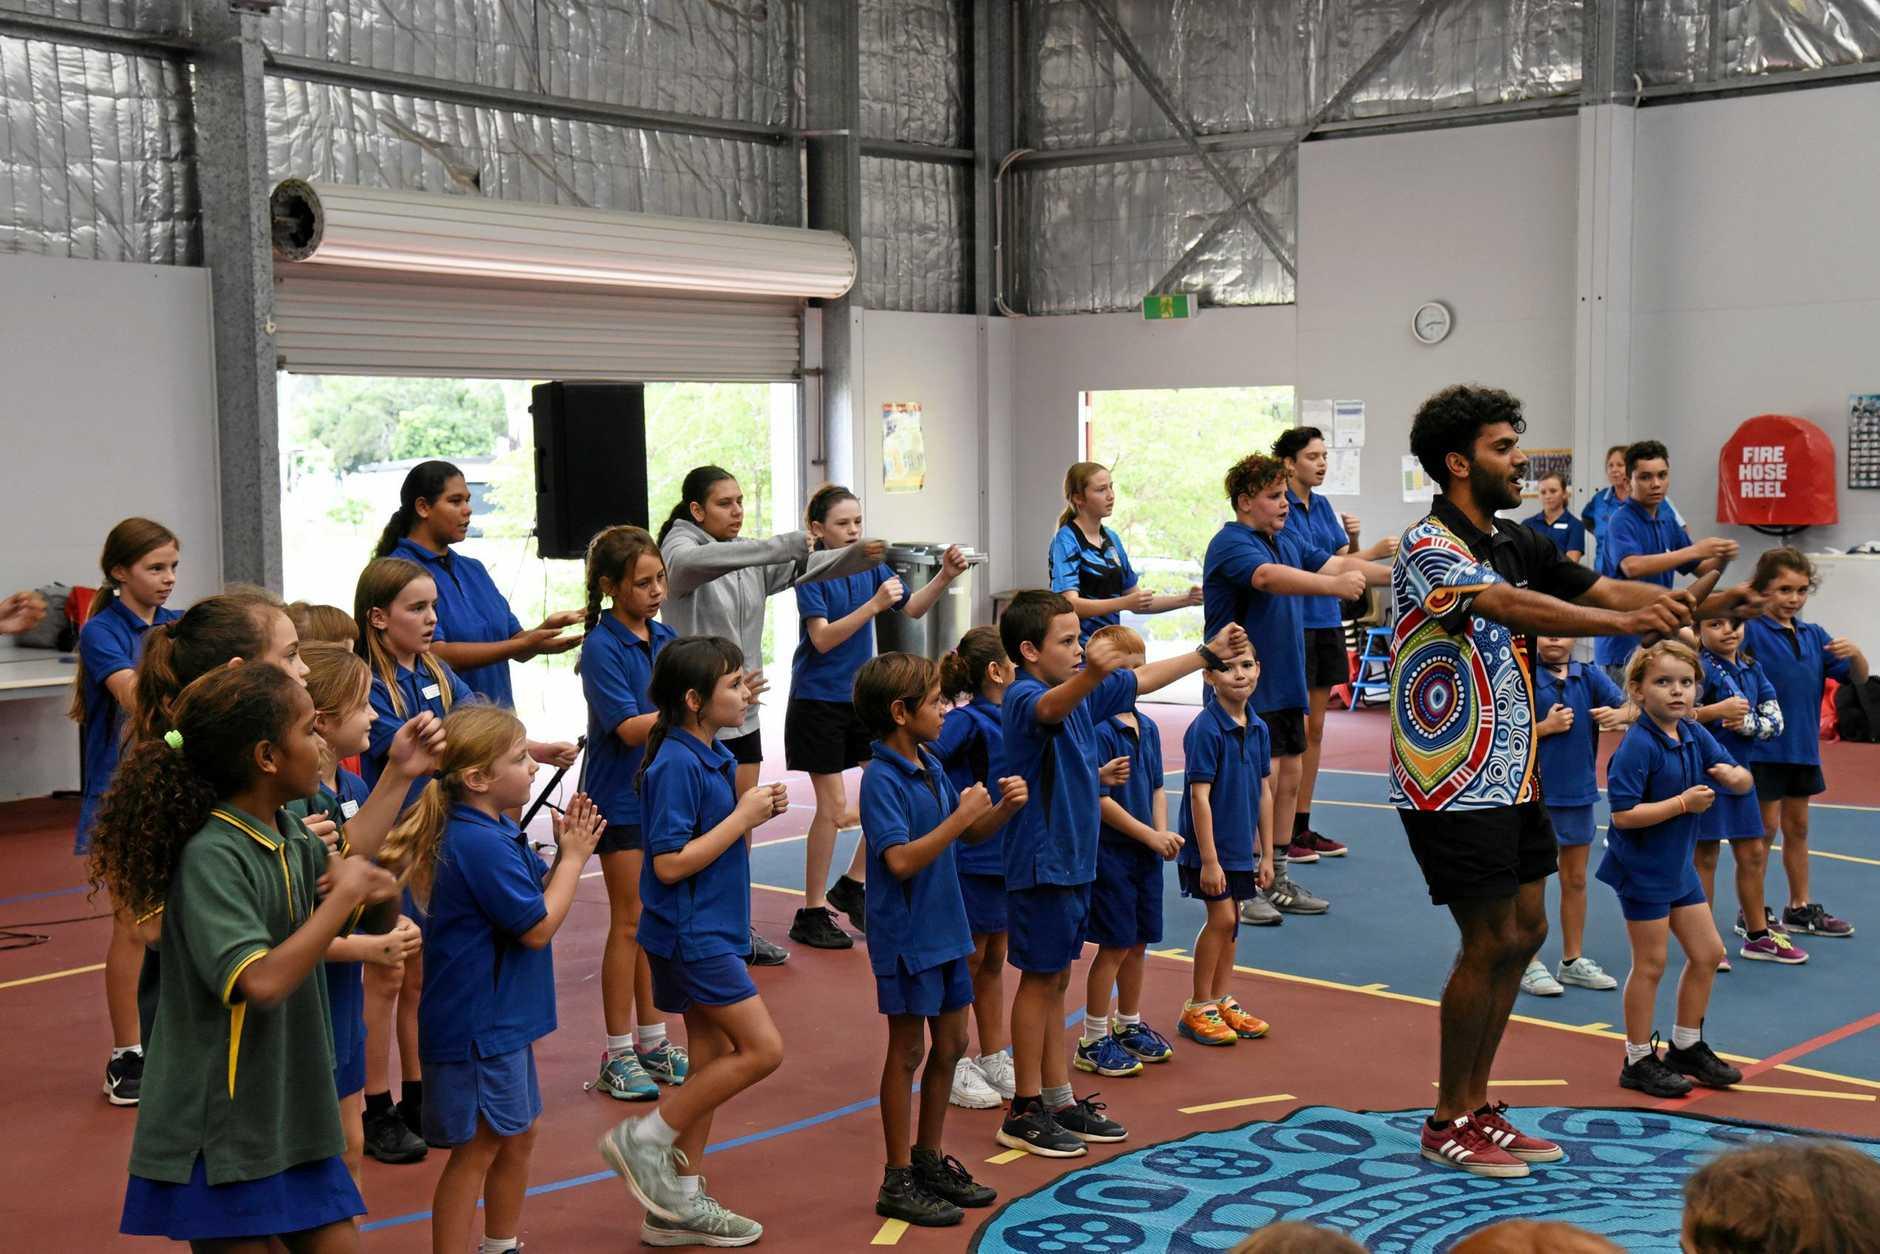 Eidsvold State School teacher aide Corey Appo leading students in Wakka Wakka farewell dance 'Gari Gynda Narmi' to see off departing principal Graeme Weatherburn.